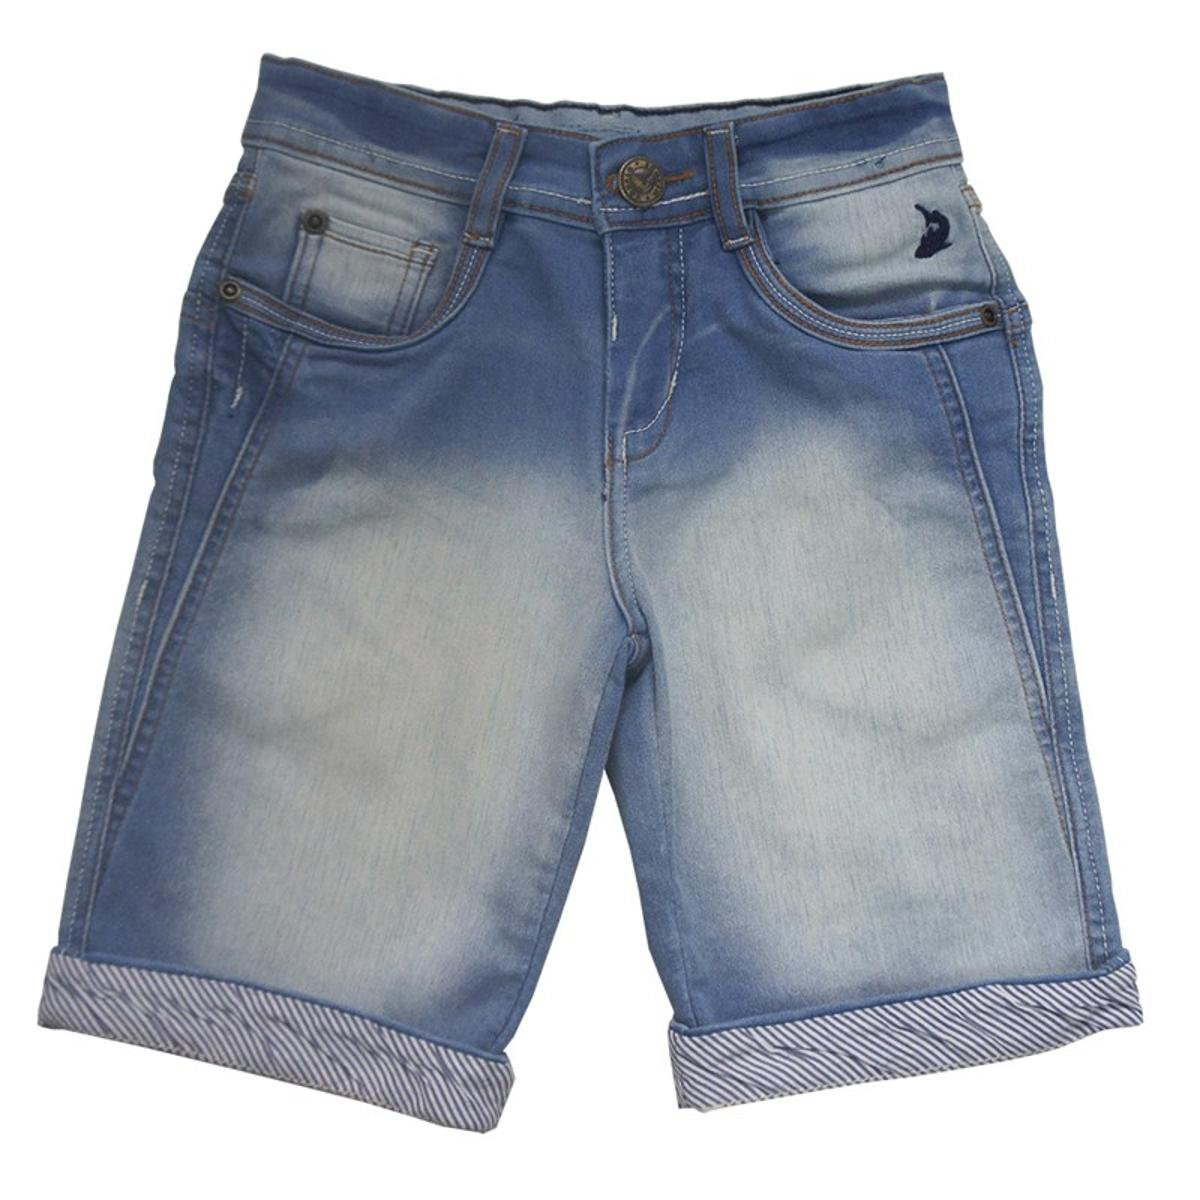 b497a0b2d Bermuda Jeans Infantil Squalo Masculino Azul Compre Agora Netshoes